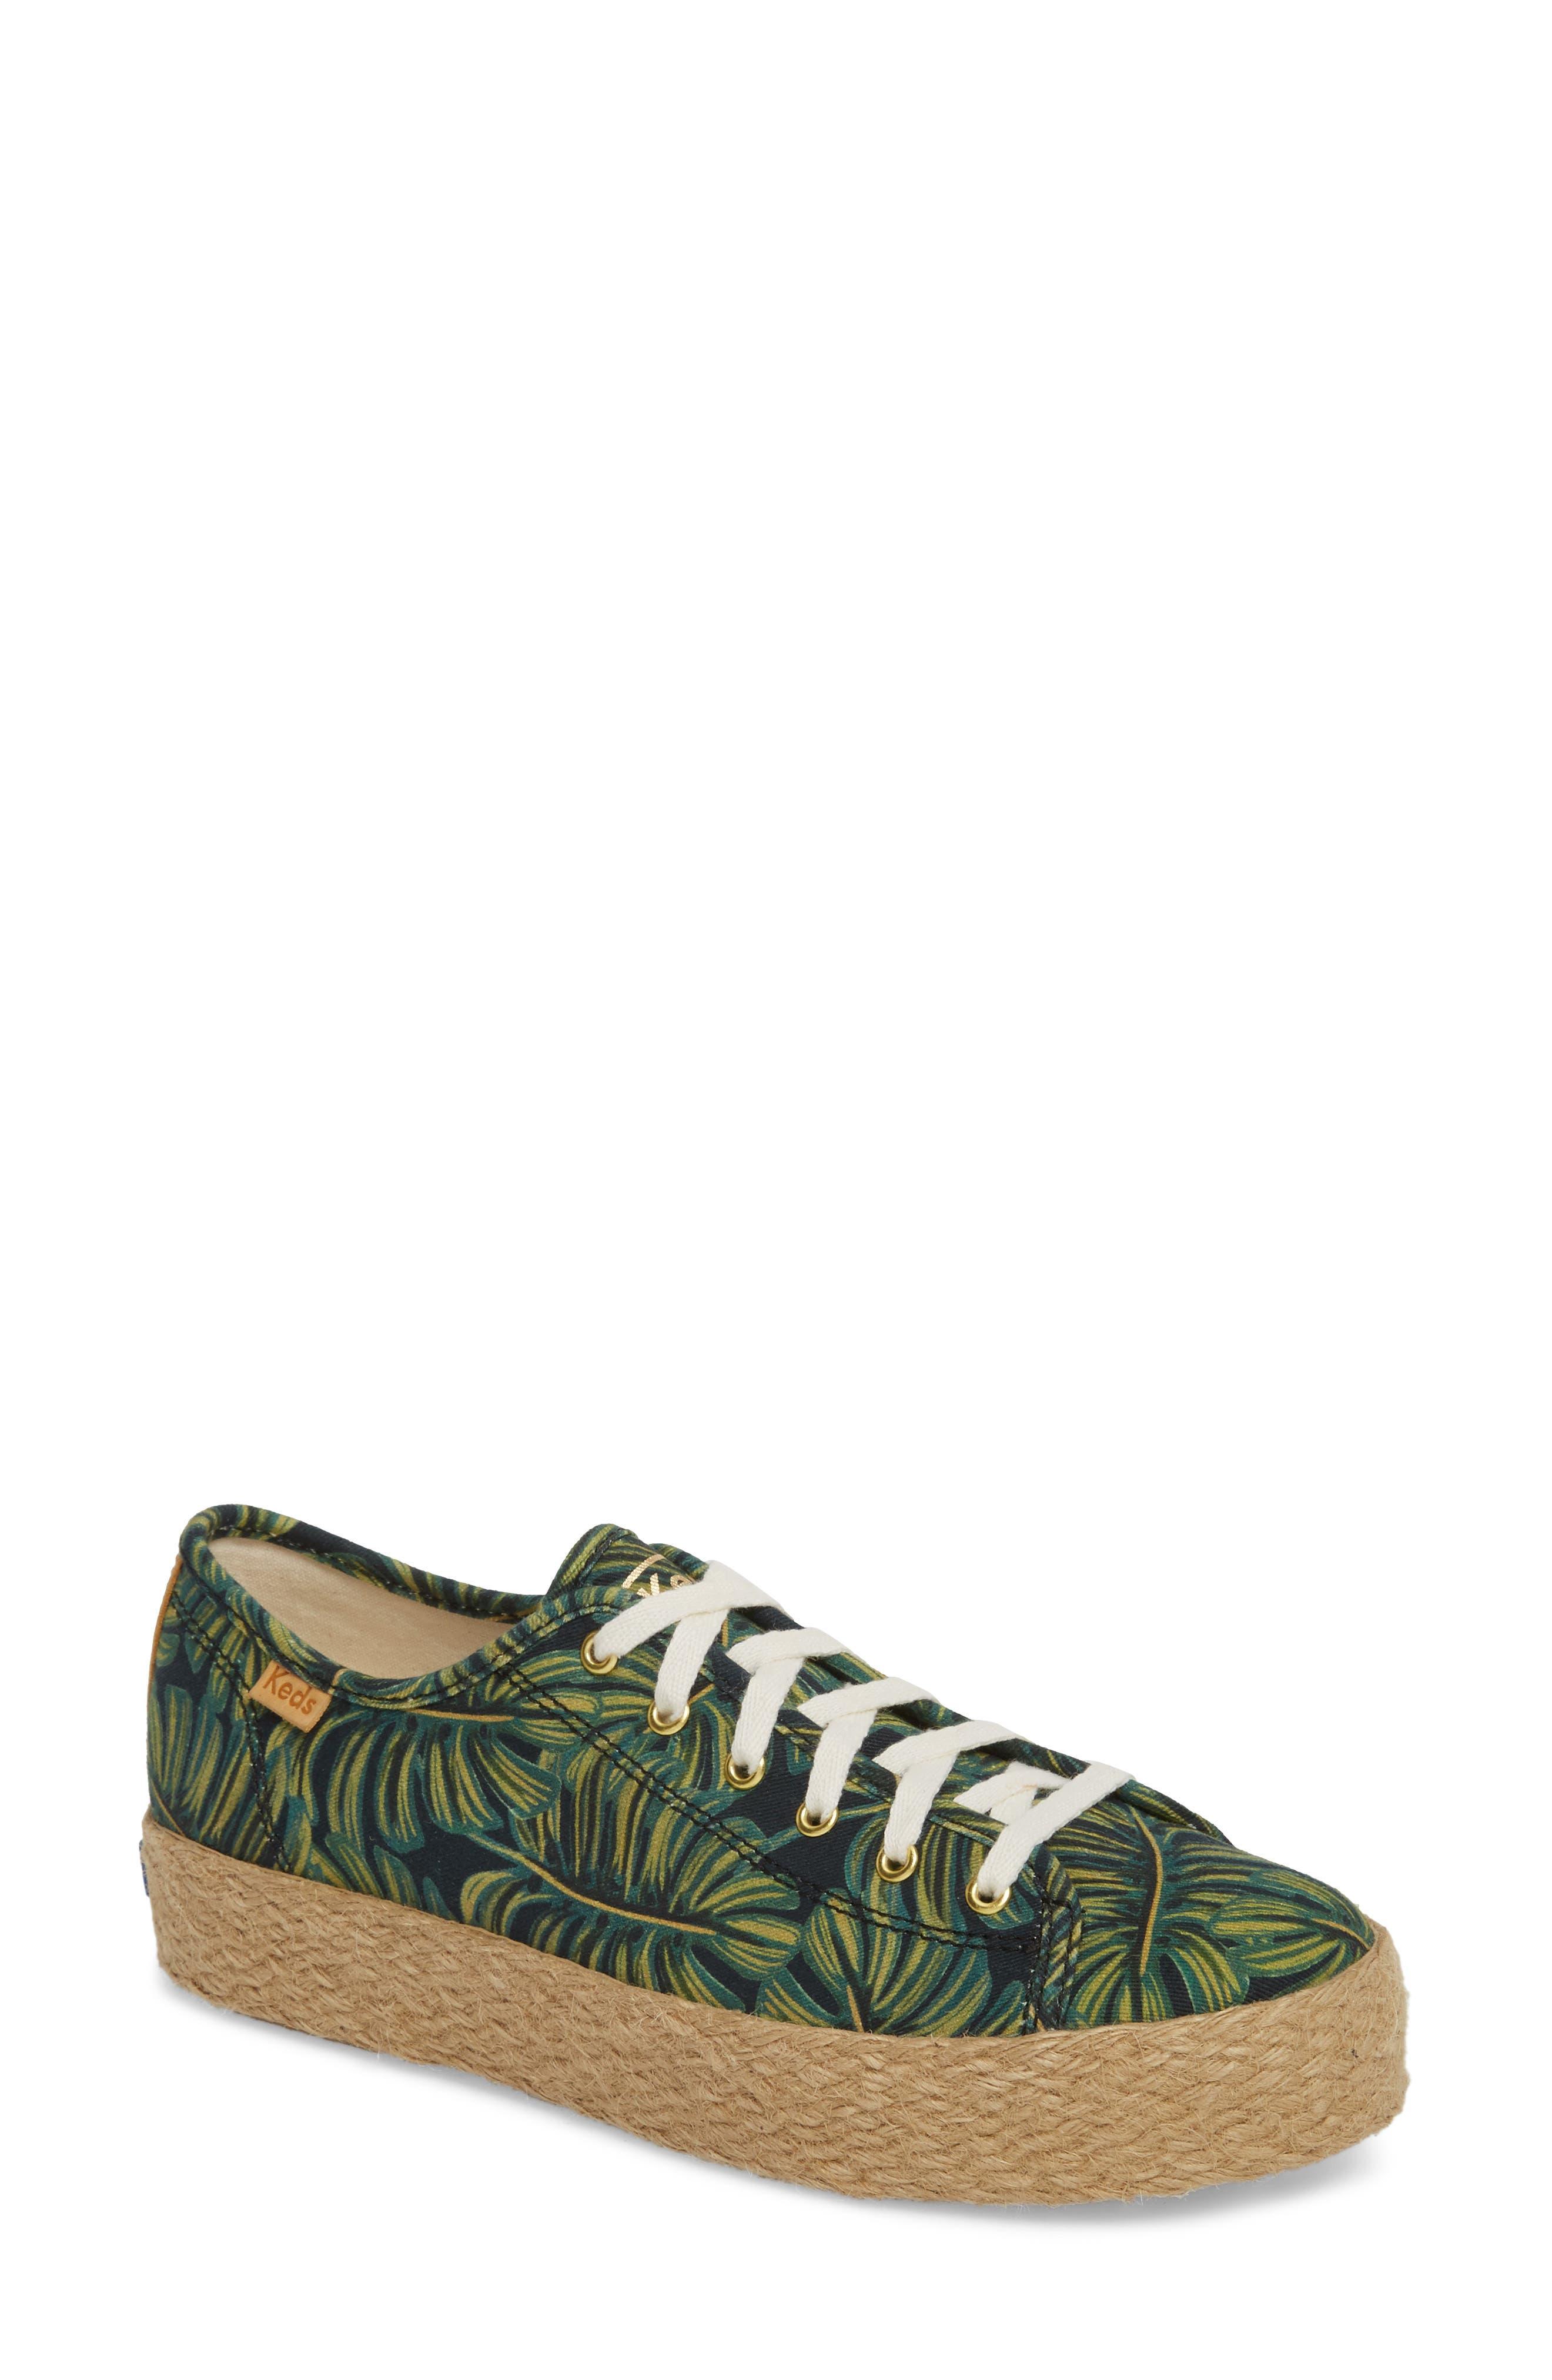 KEDS<SUP>®</SUP> x Rifle Paper Co. Triple Kick Palms Platform Sneaker, Main, color, 001